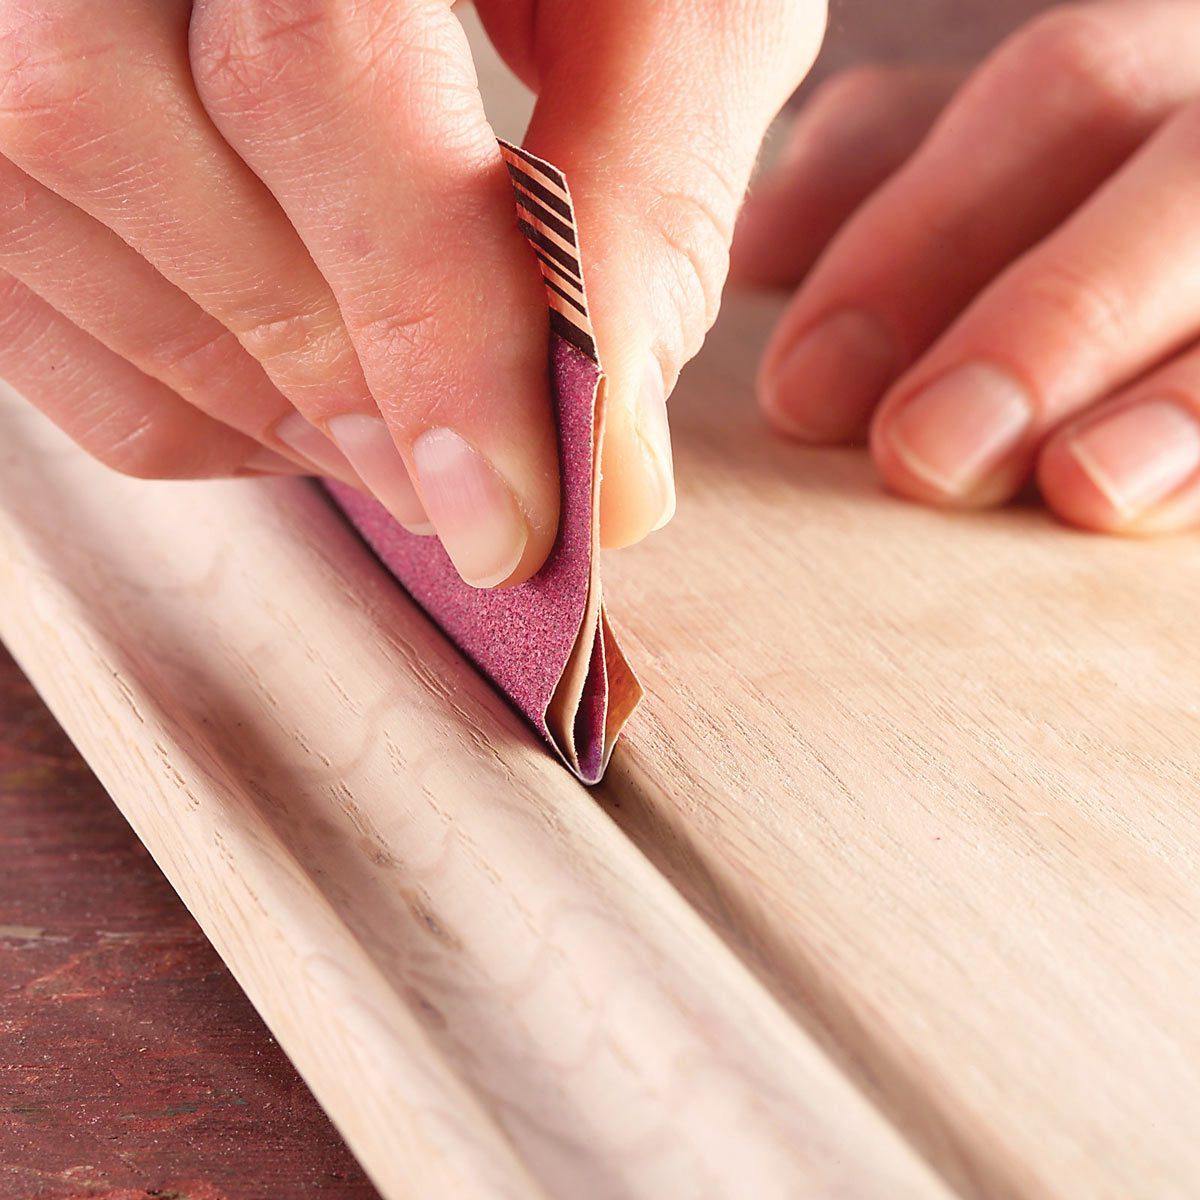 Trim Material Options: Bare Wood